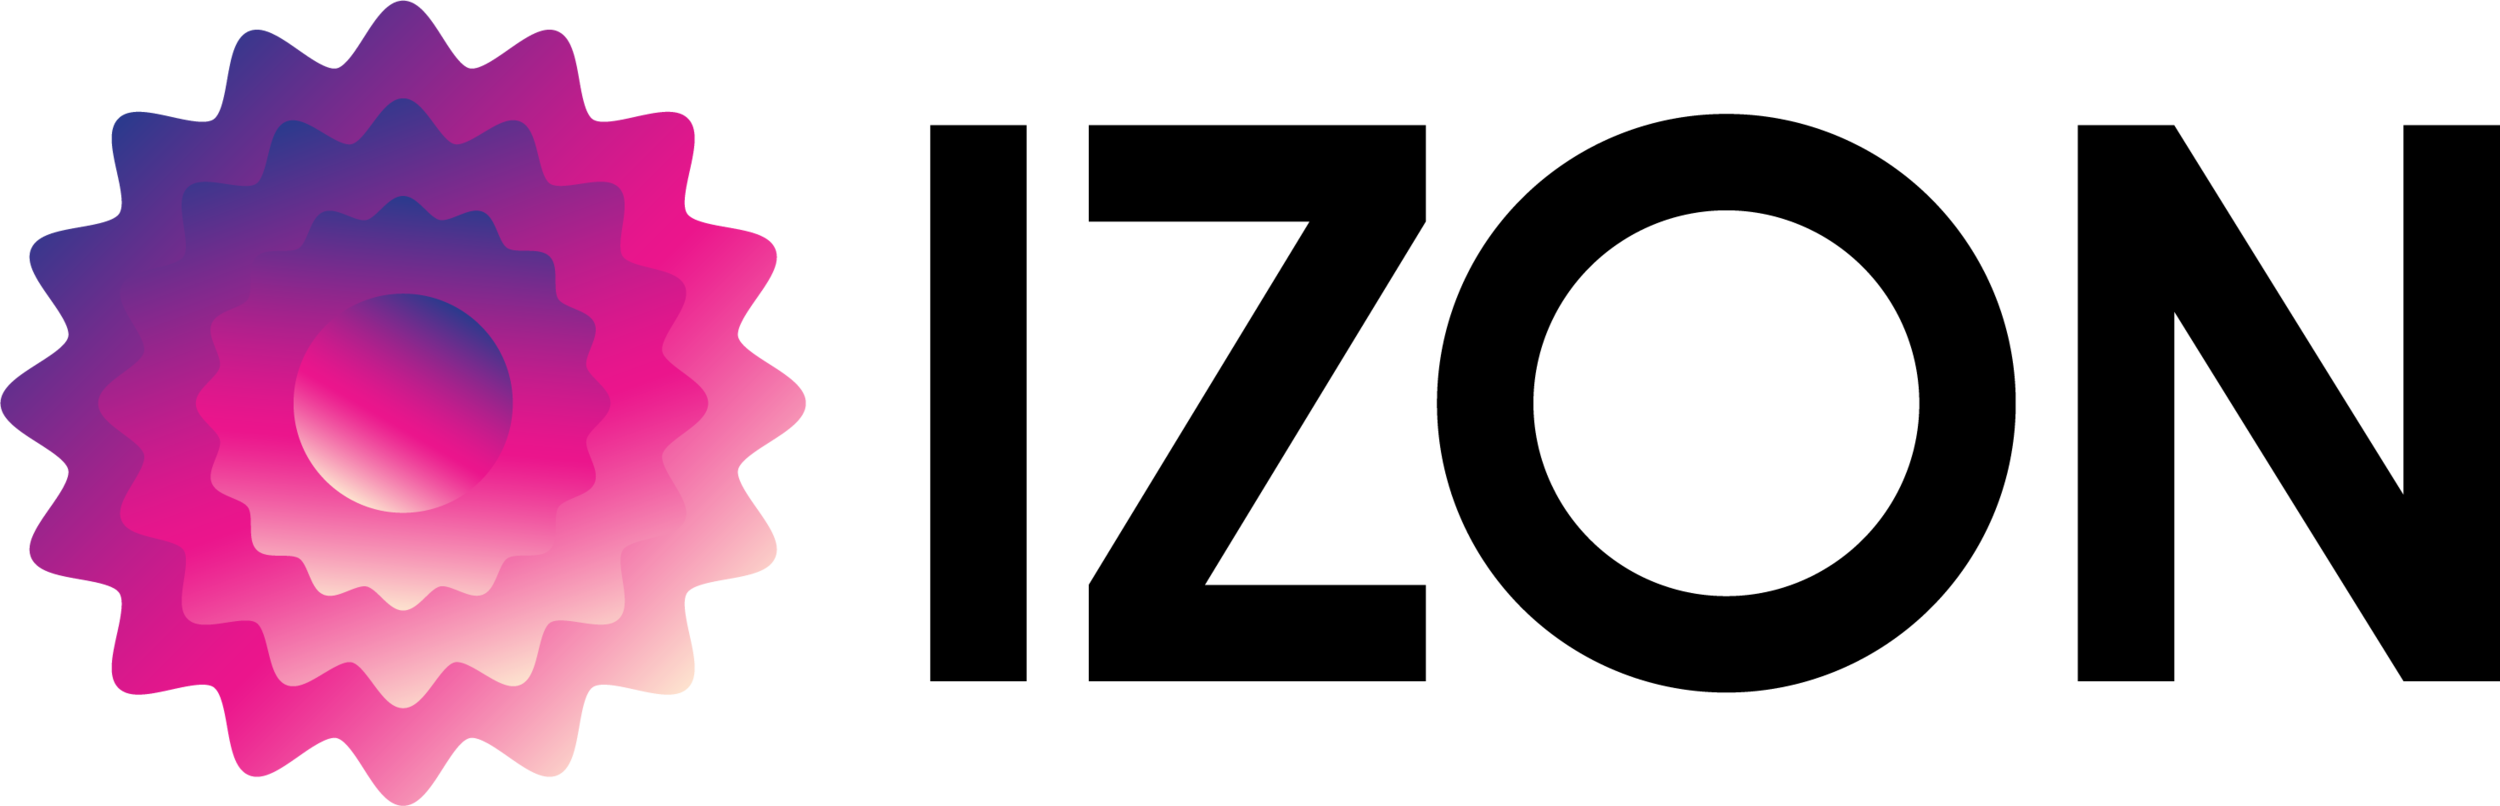 Izon_Science.png